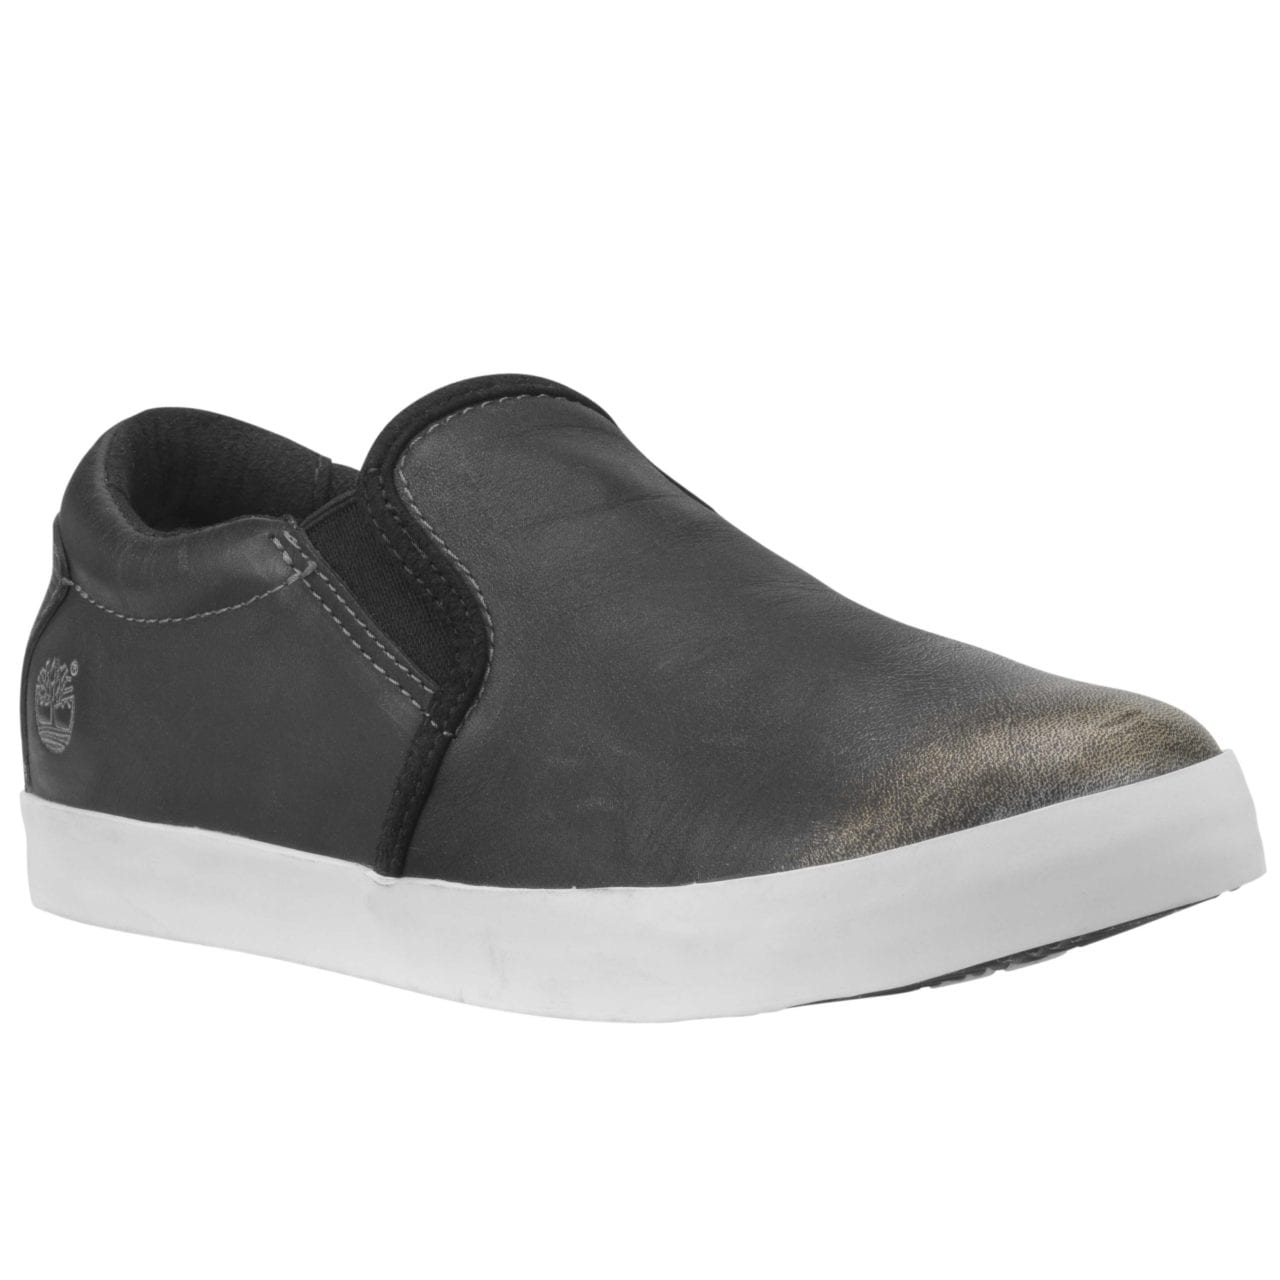 Glastenbury Leather Slip-On Black_$199.00